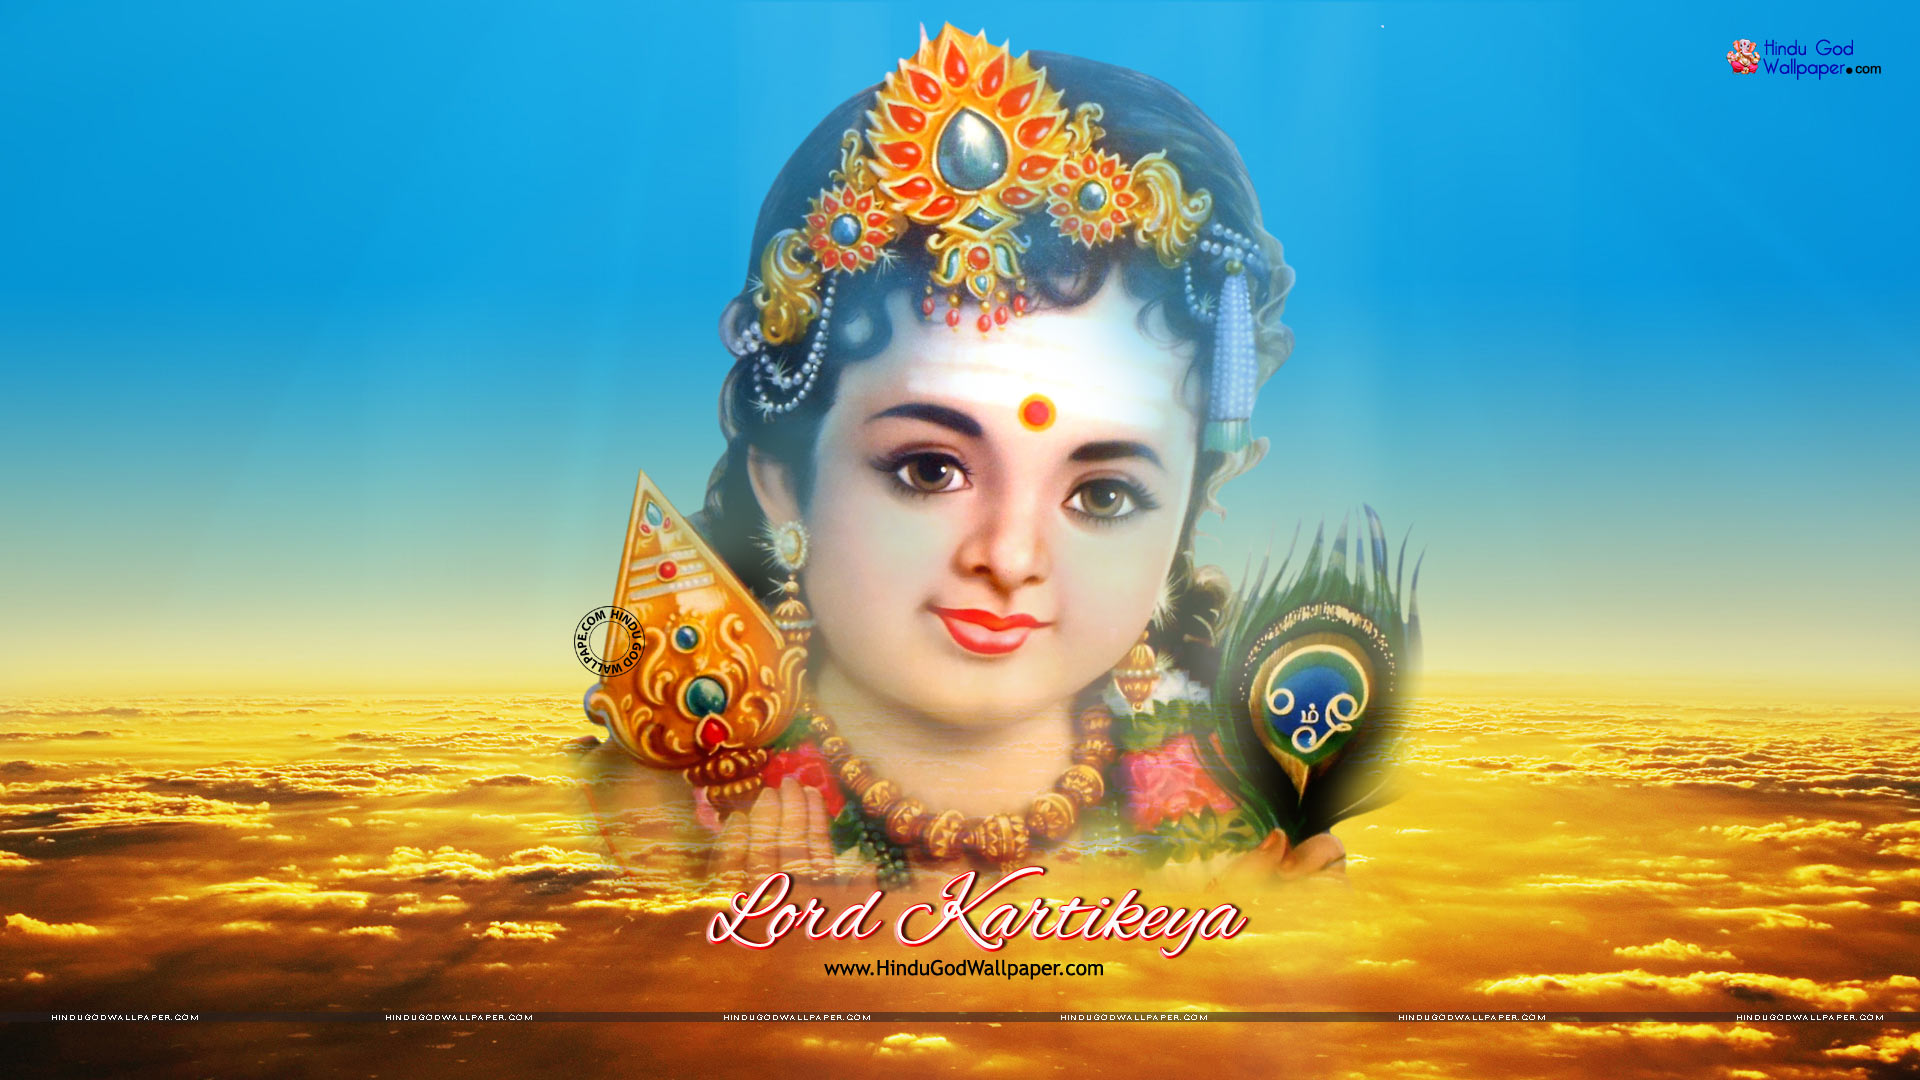 lord kartikeya hd wallpaper